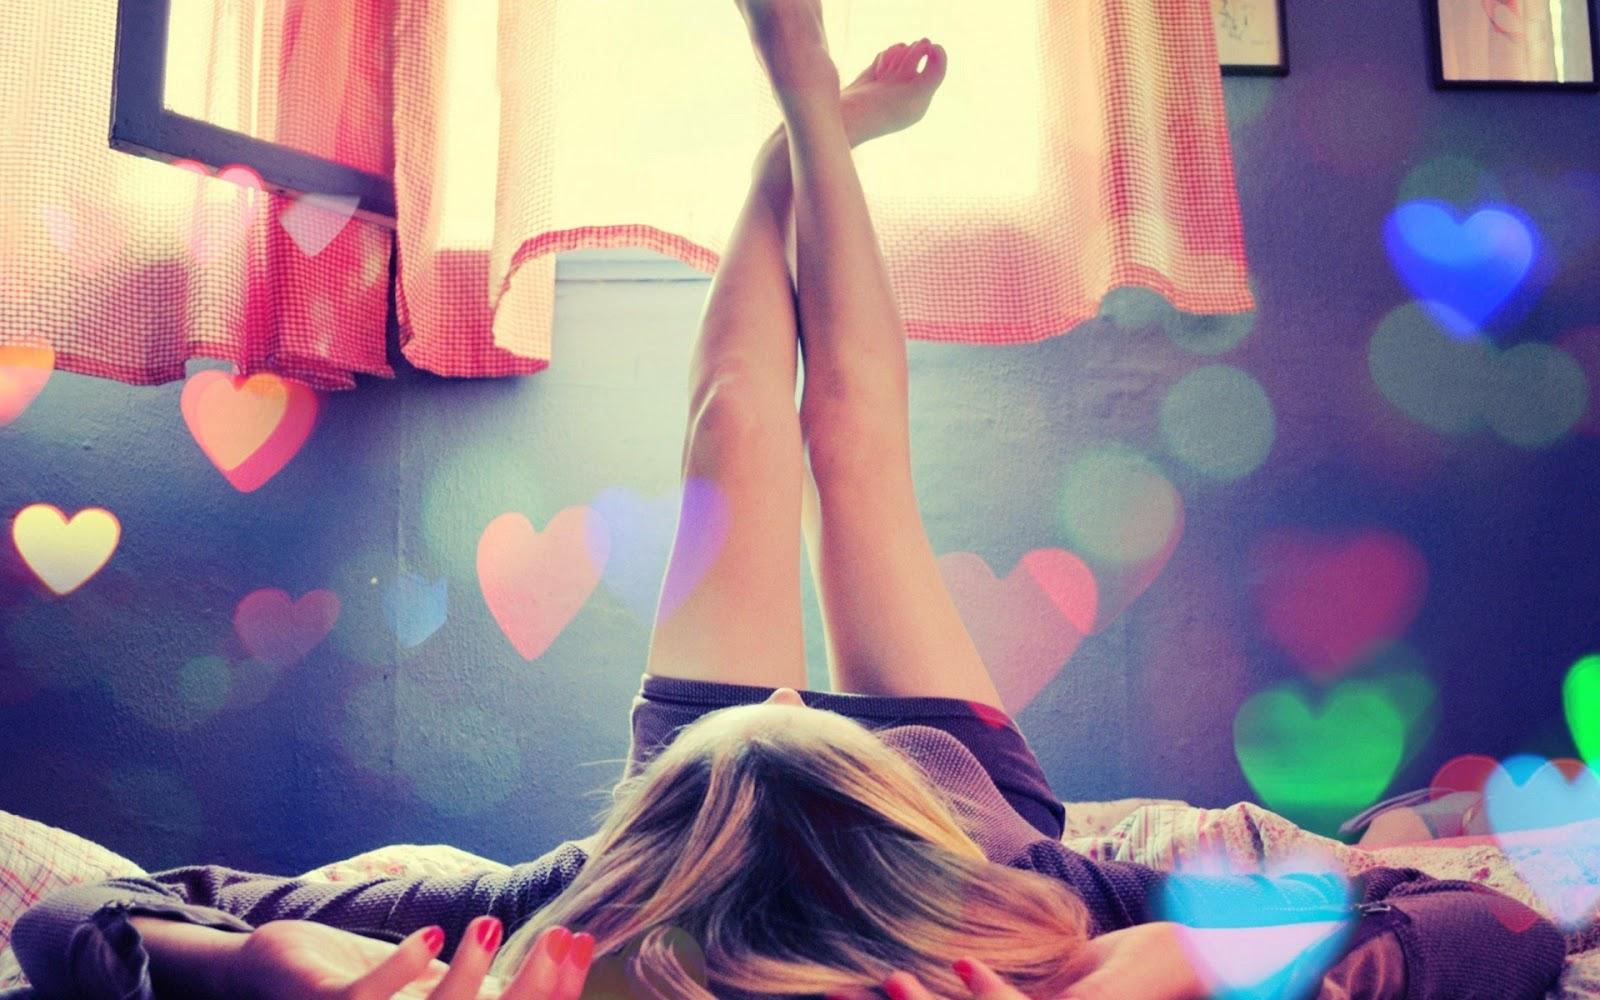 Girl-In-Love-at-bed-dream-window.jpg